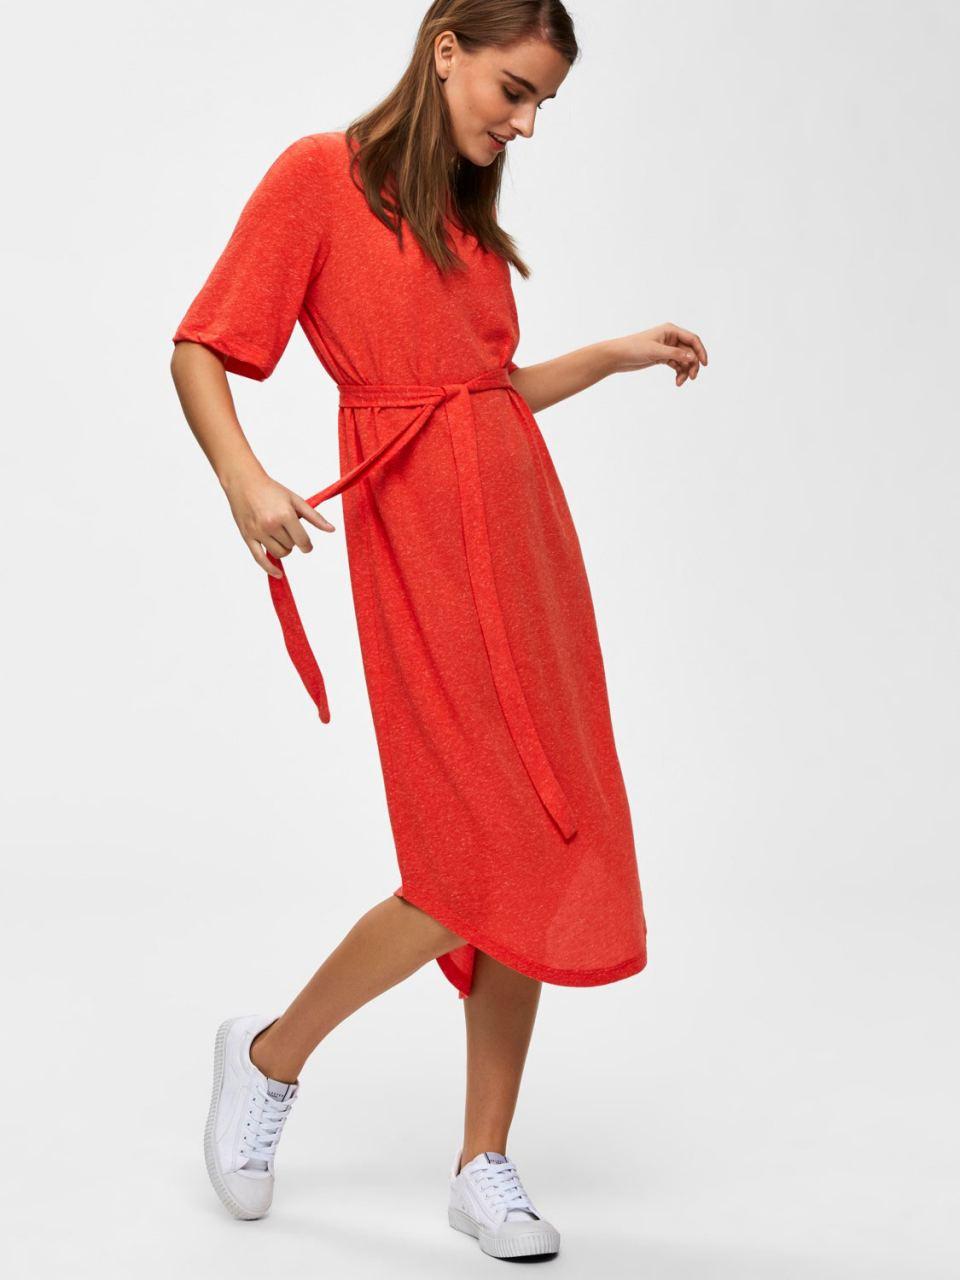 SLFIvy Kleid Cherry Tomato